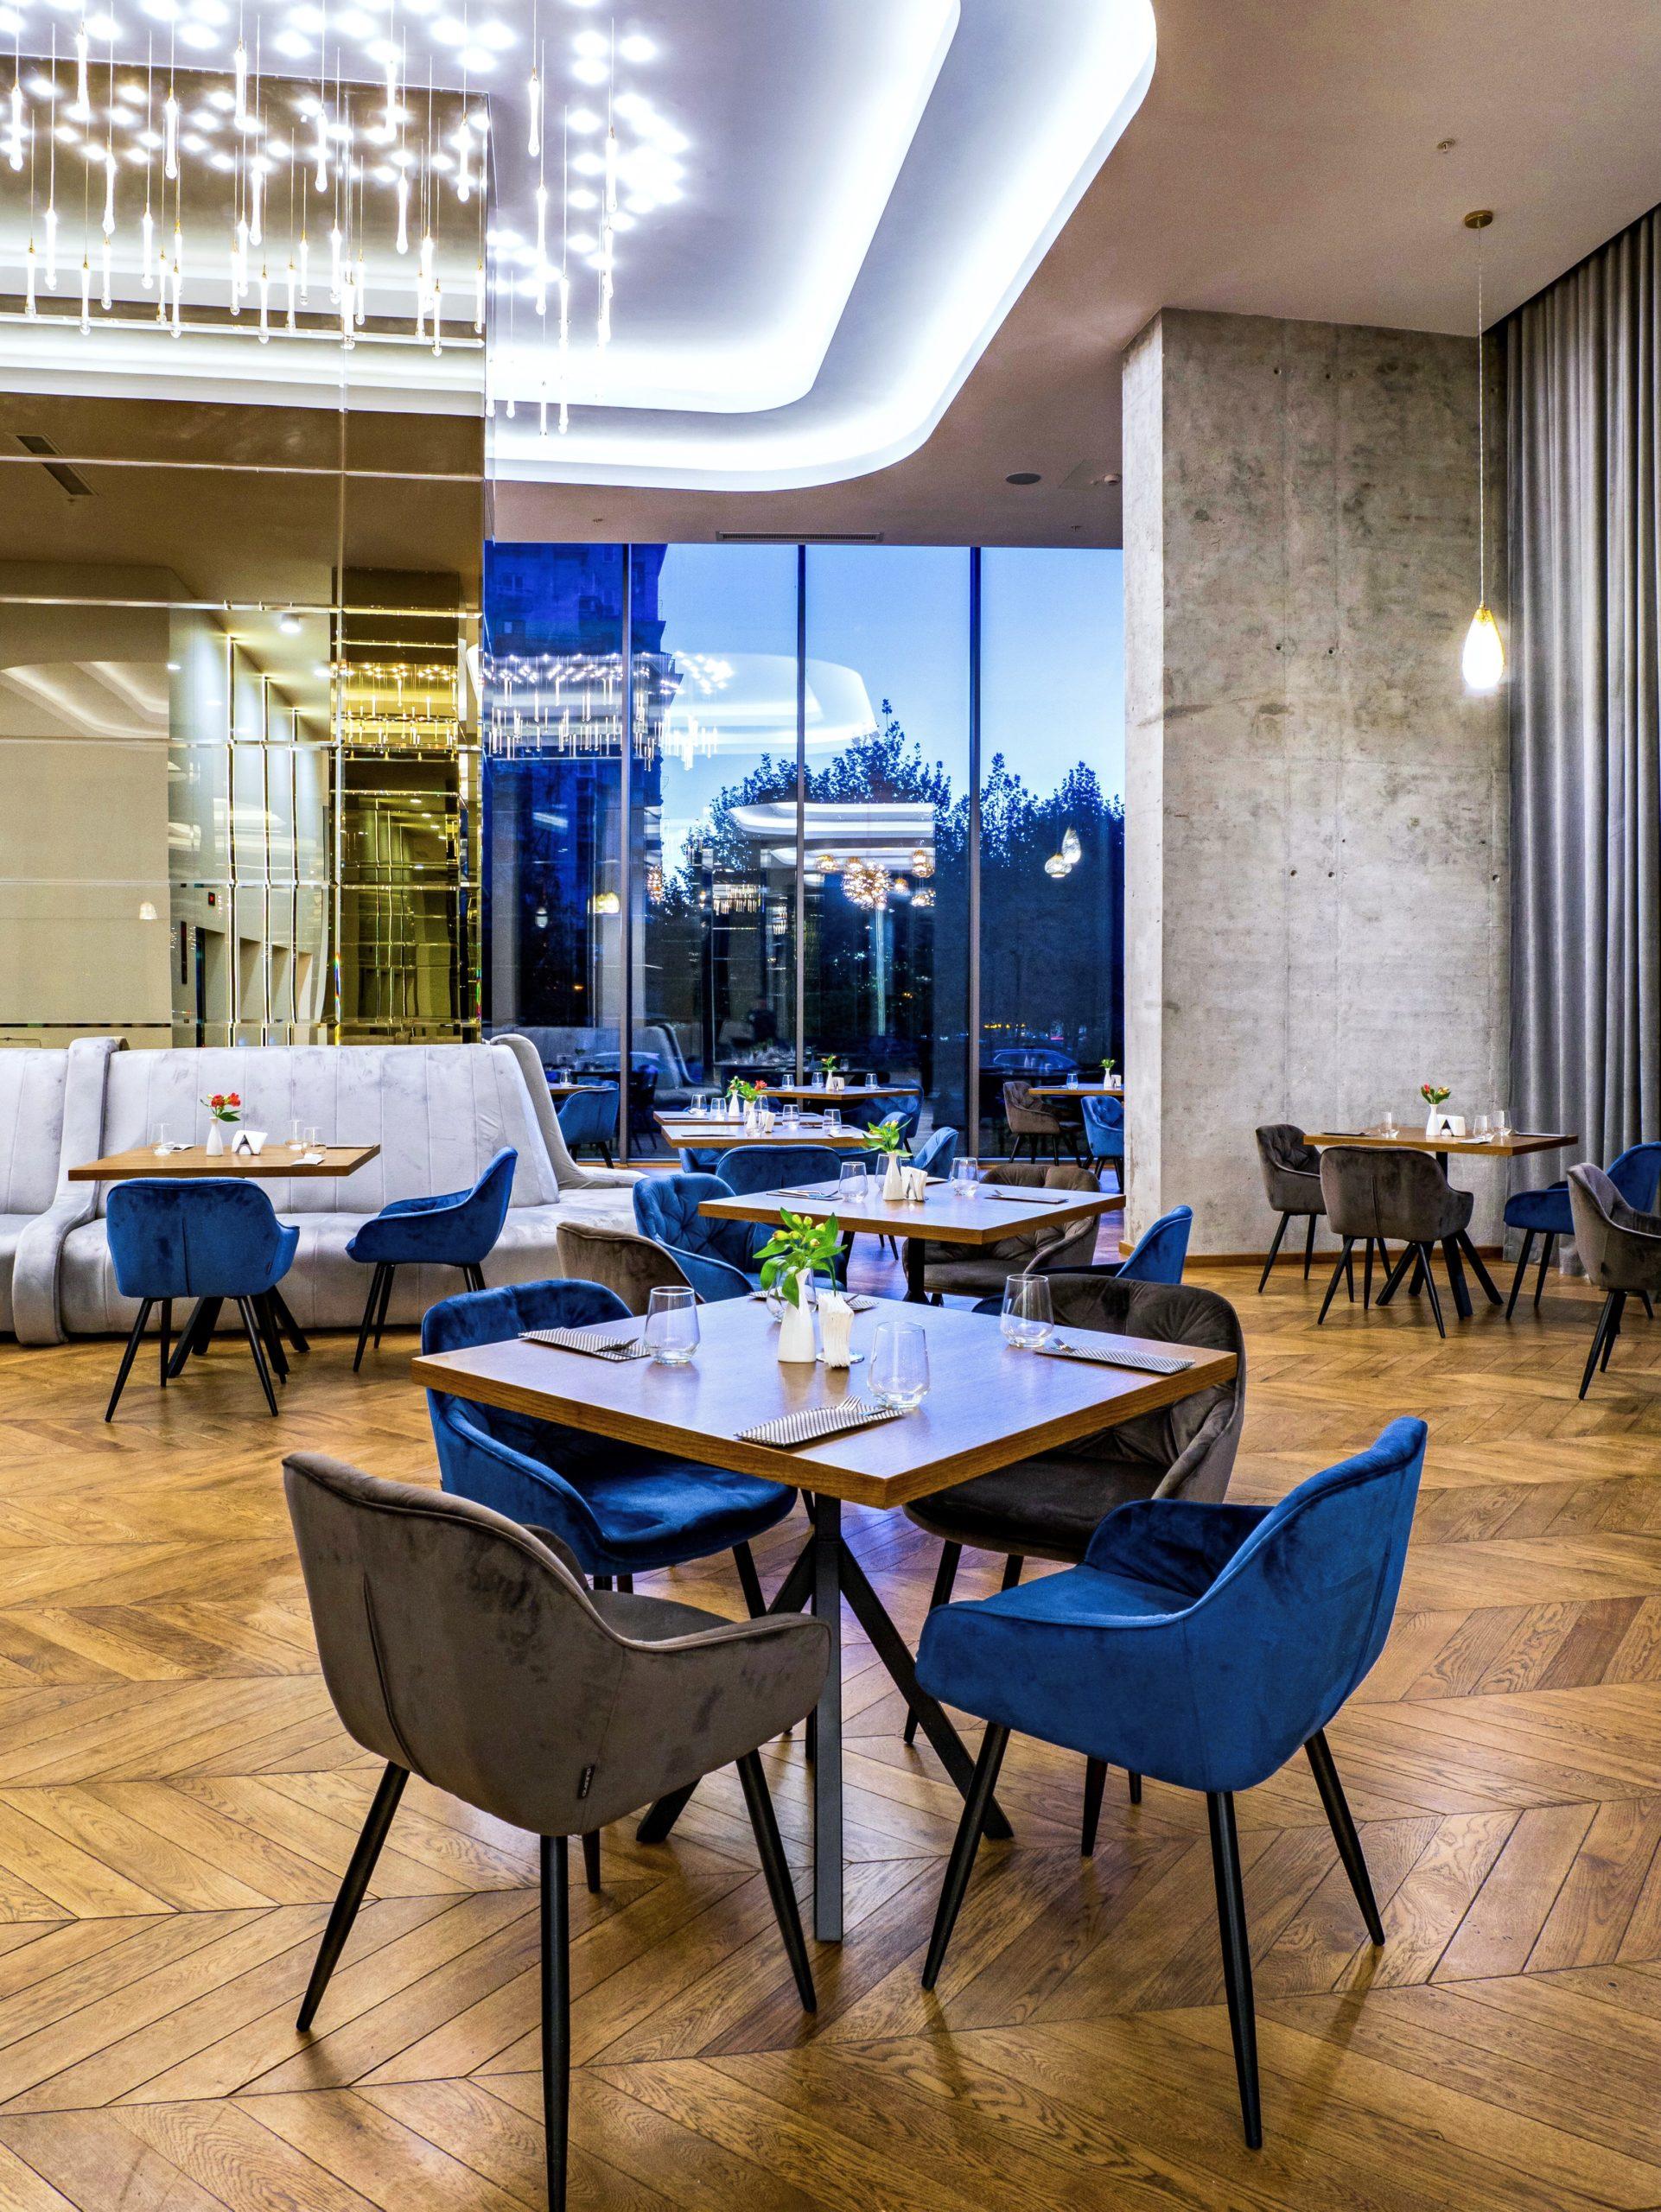 Union Plaza Hotel - Maroon Restaurant